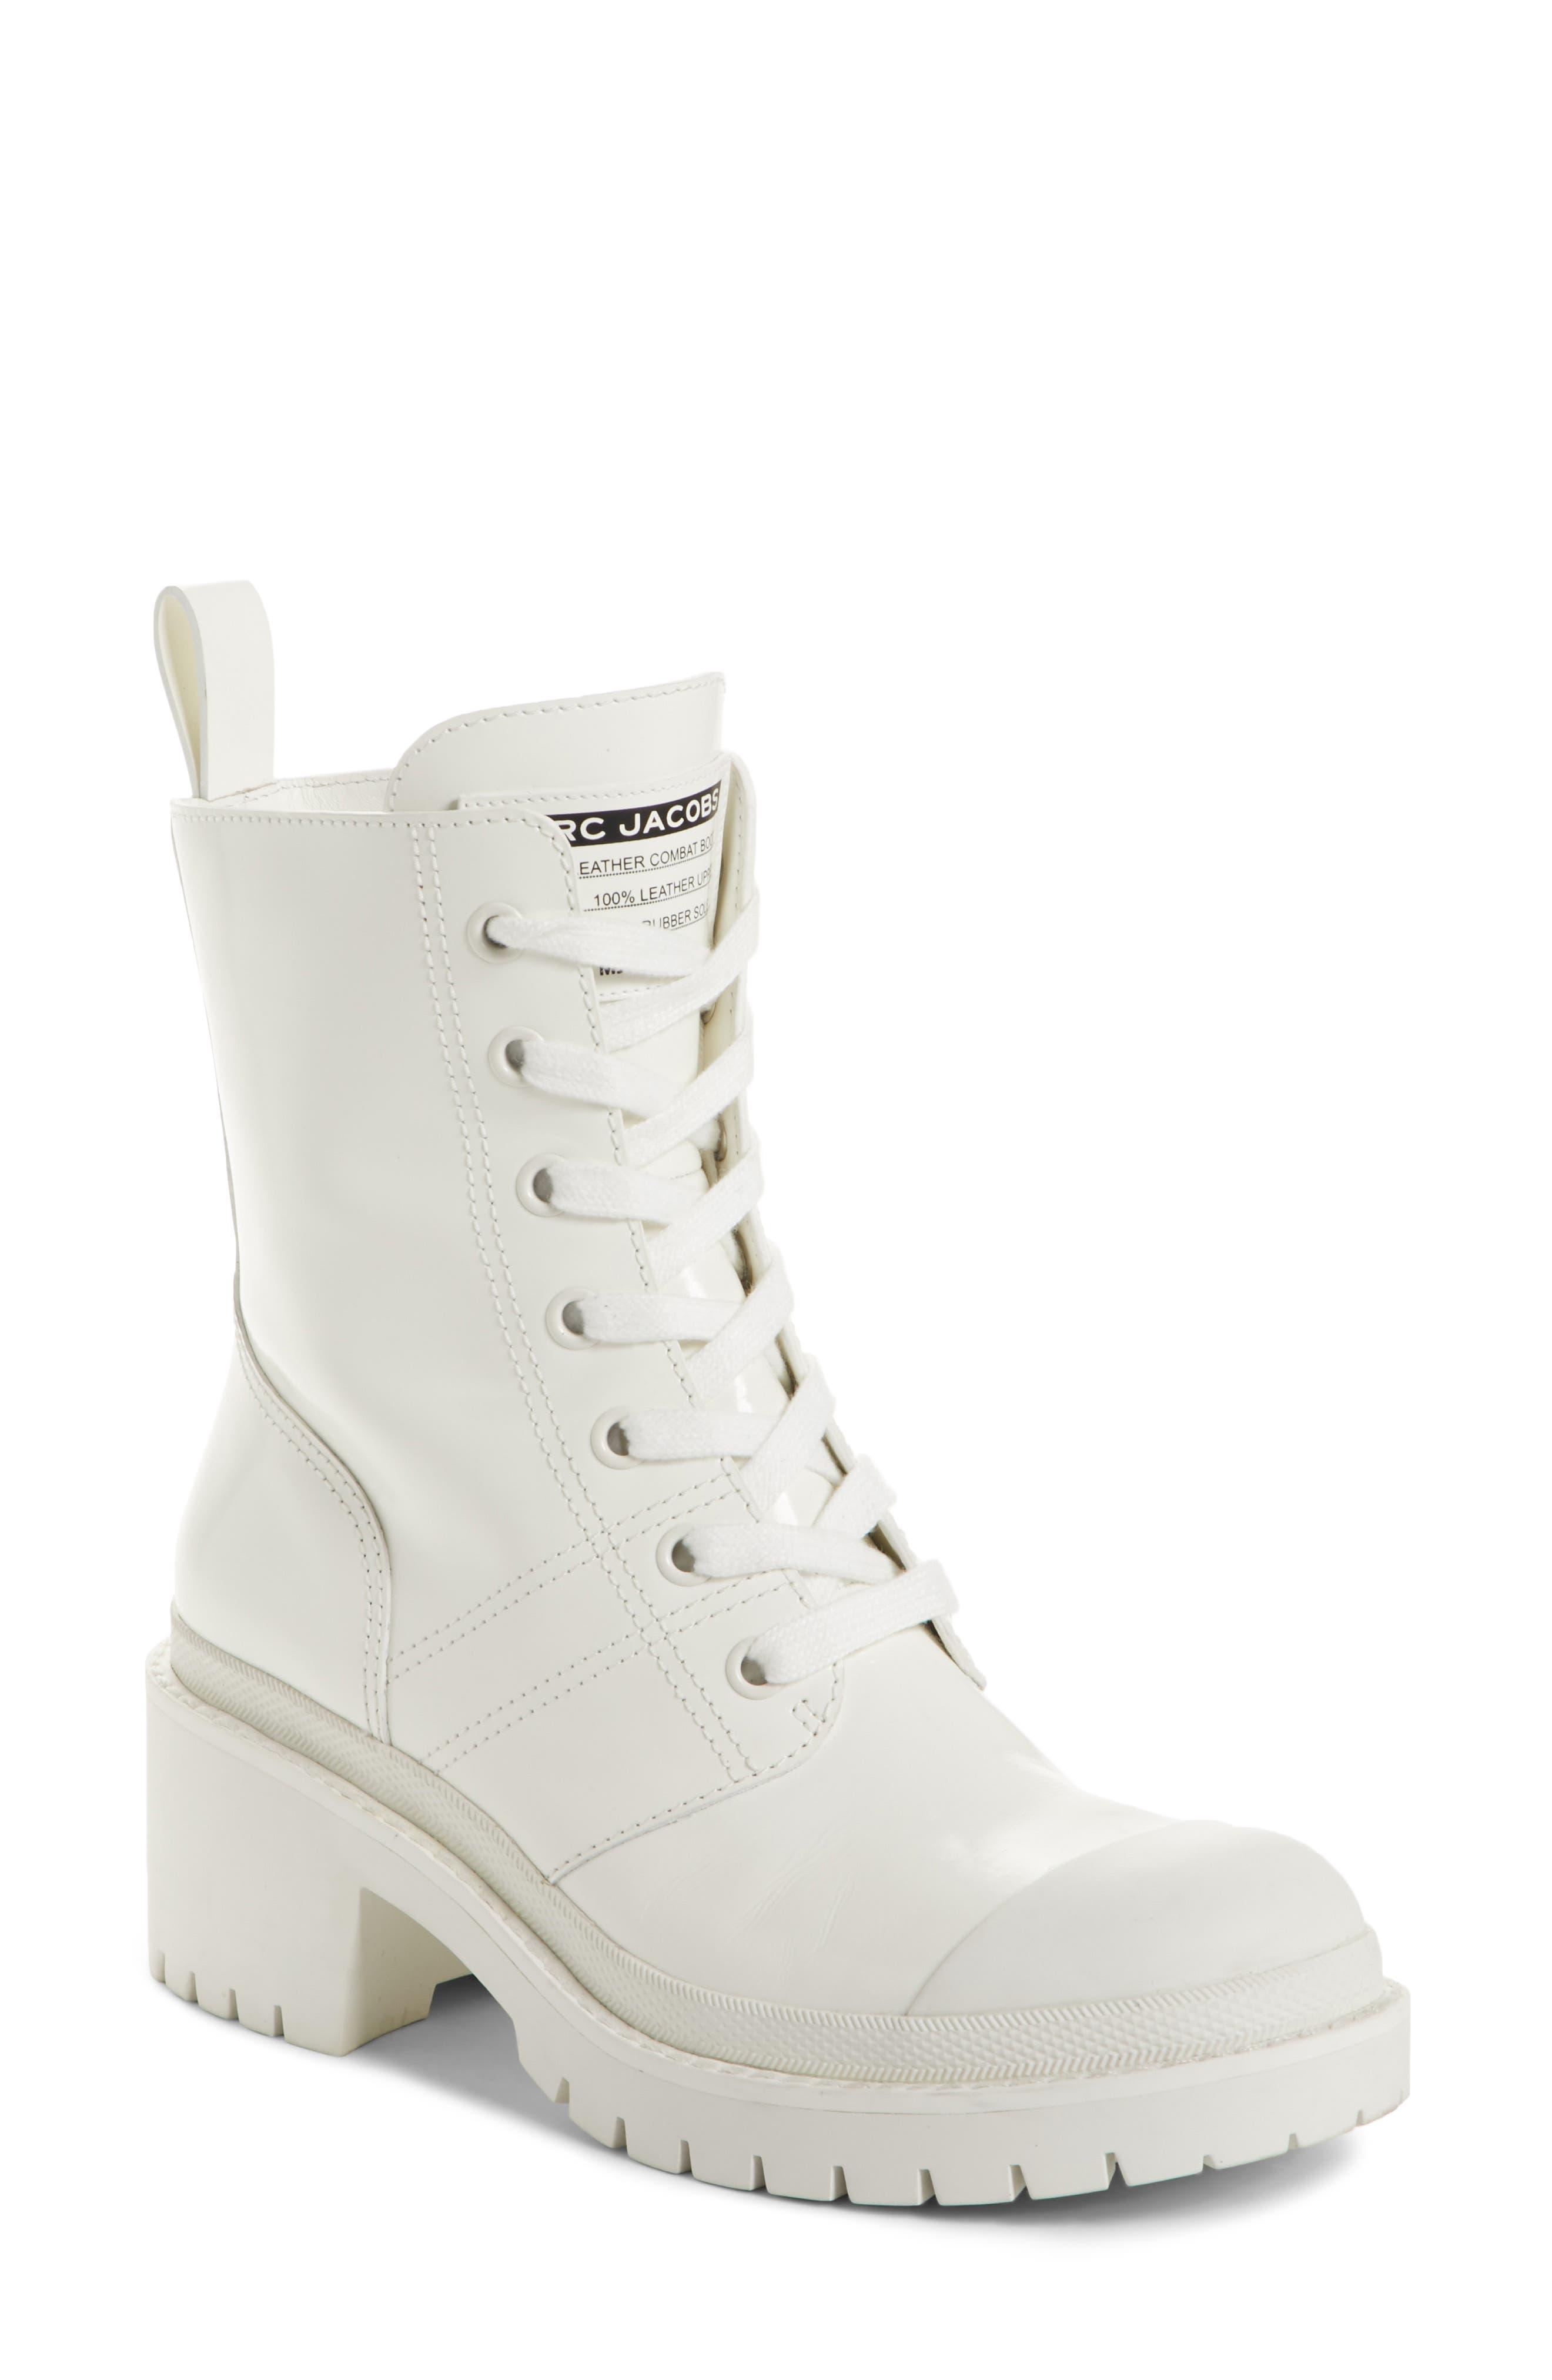 Bristol Lace-Up Boot,                             Main thumbnail 1, color,                             White